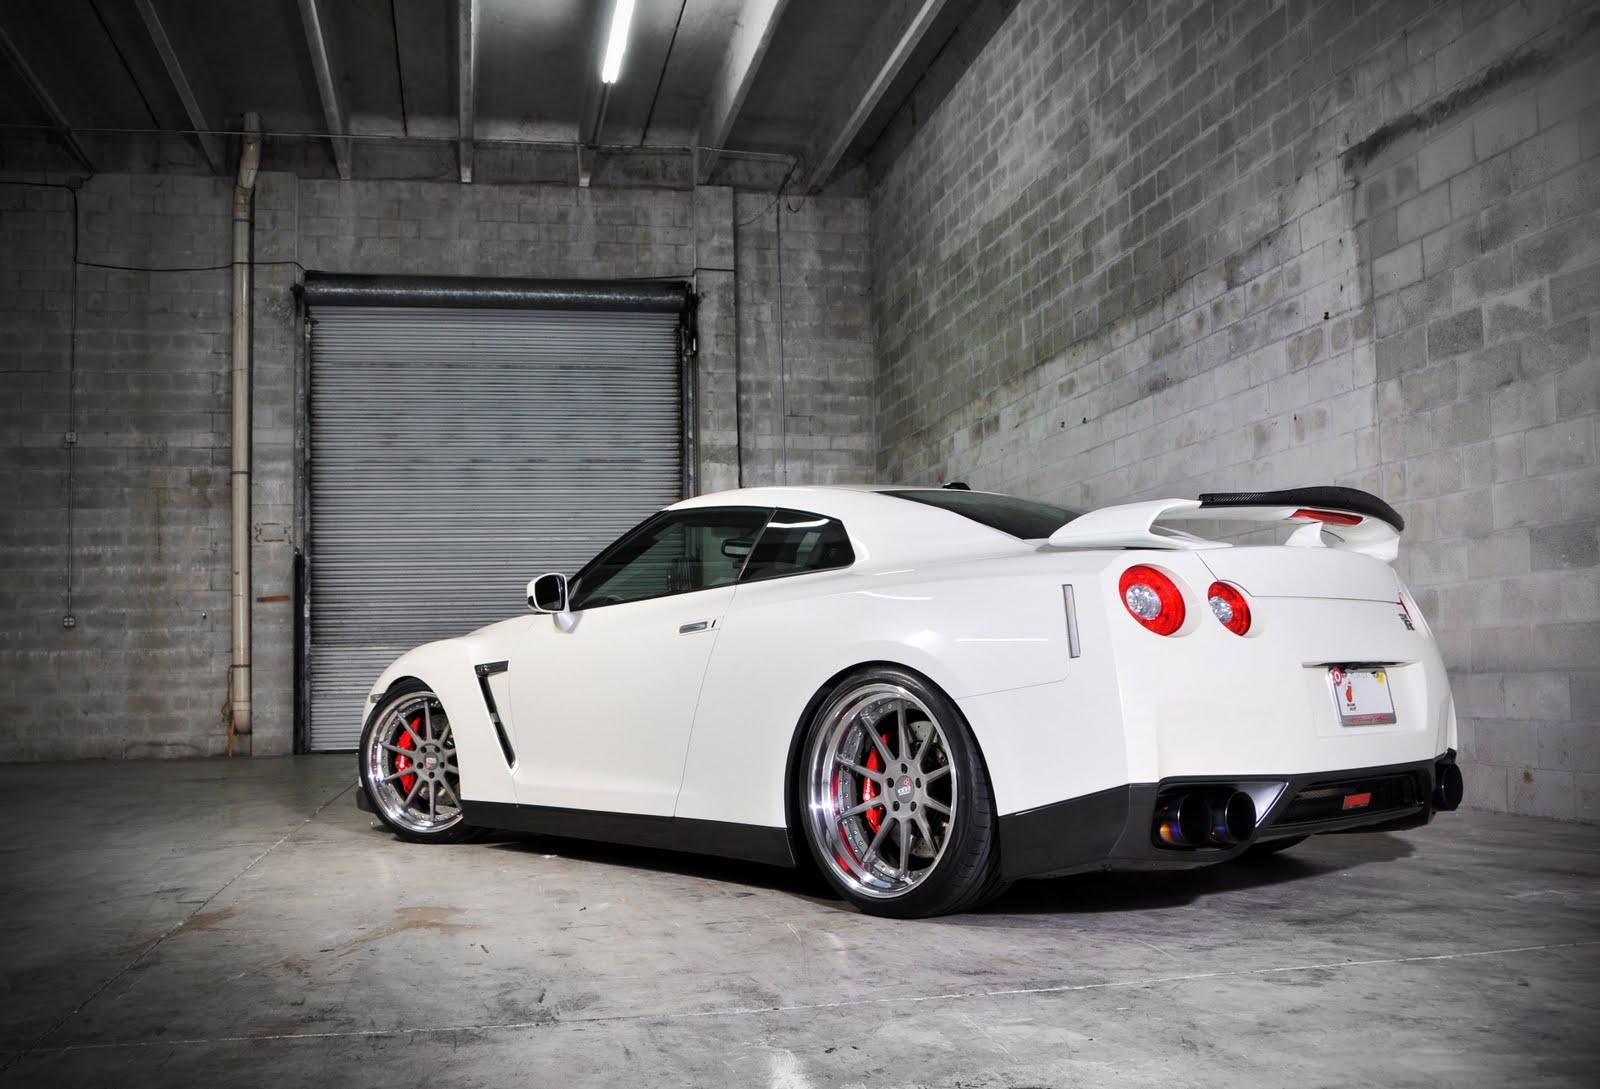 Awesome White R35 Gtr